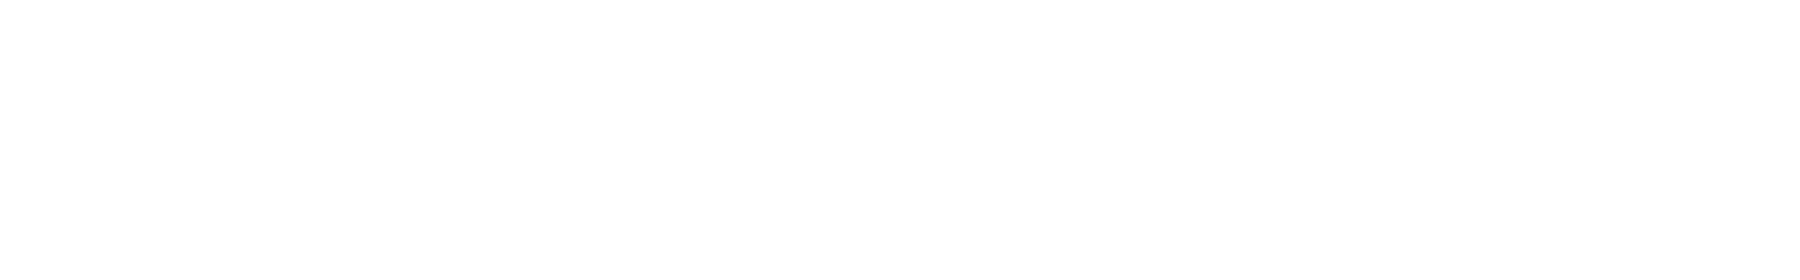 vuf1 128bpm accerlator sq 16bars c